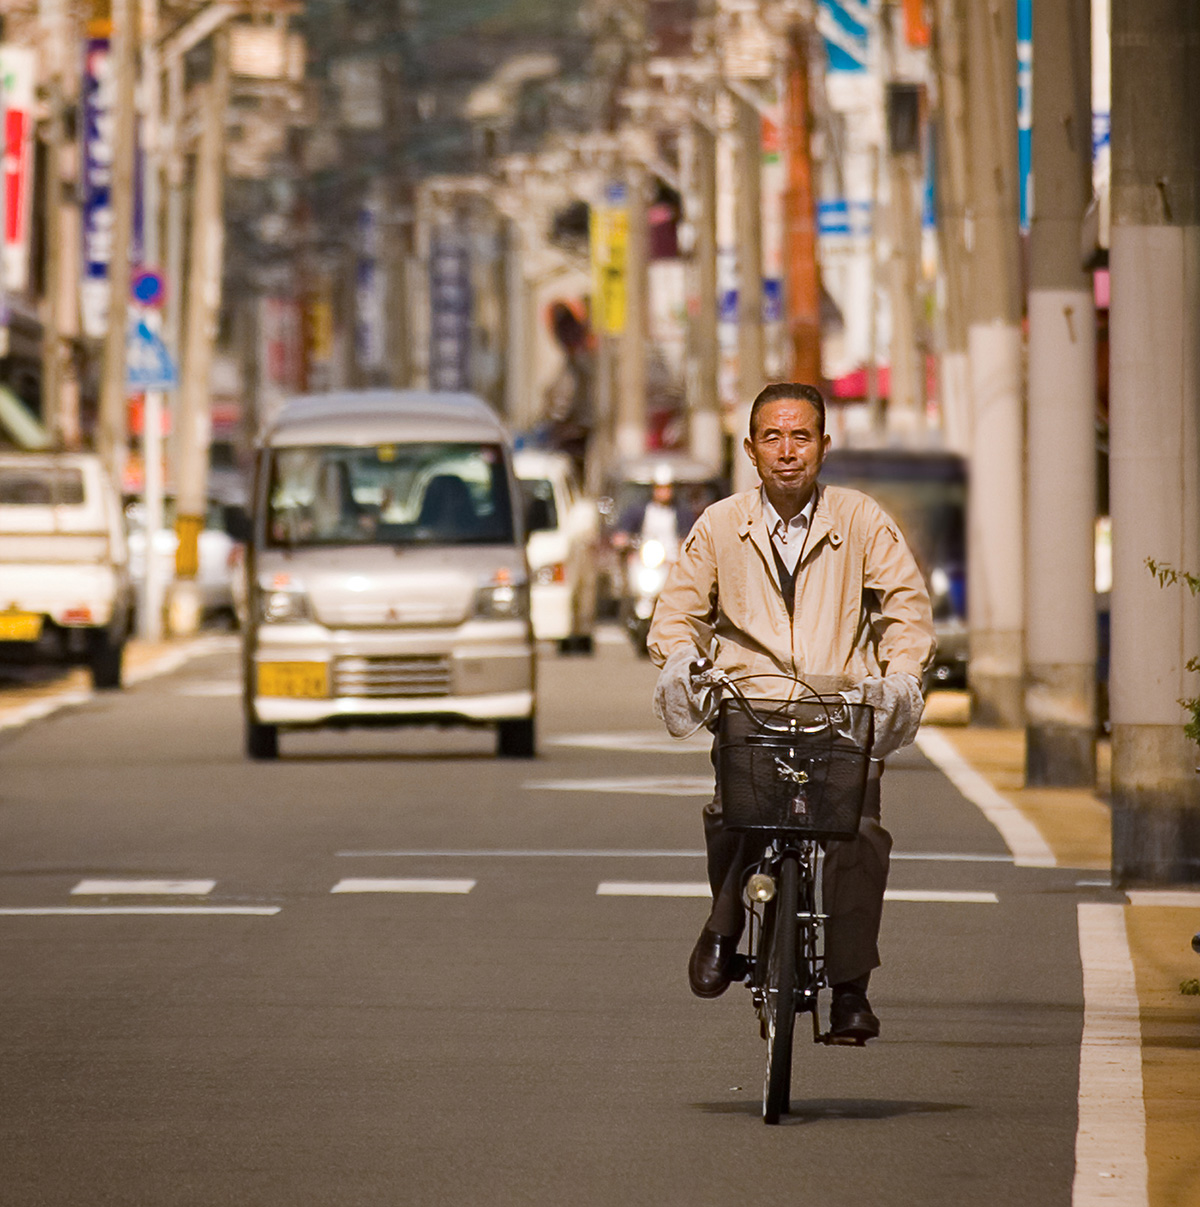 Bicyclist, Kyoto, Japan